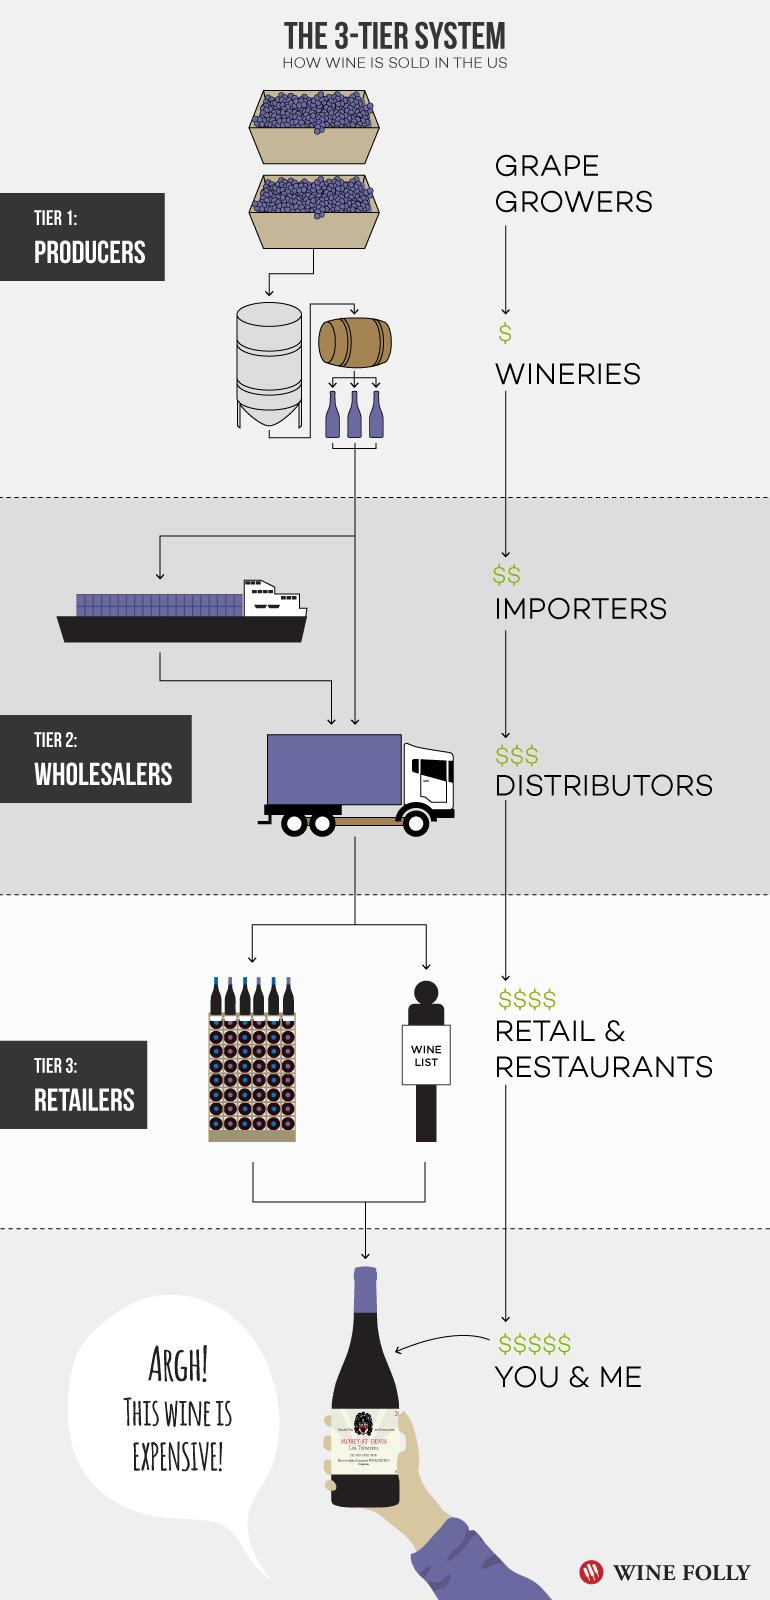 wine-distribution-3-tier-system-alcohol-usa